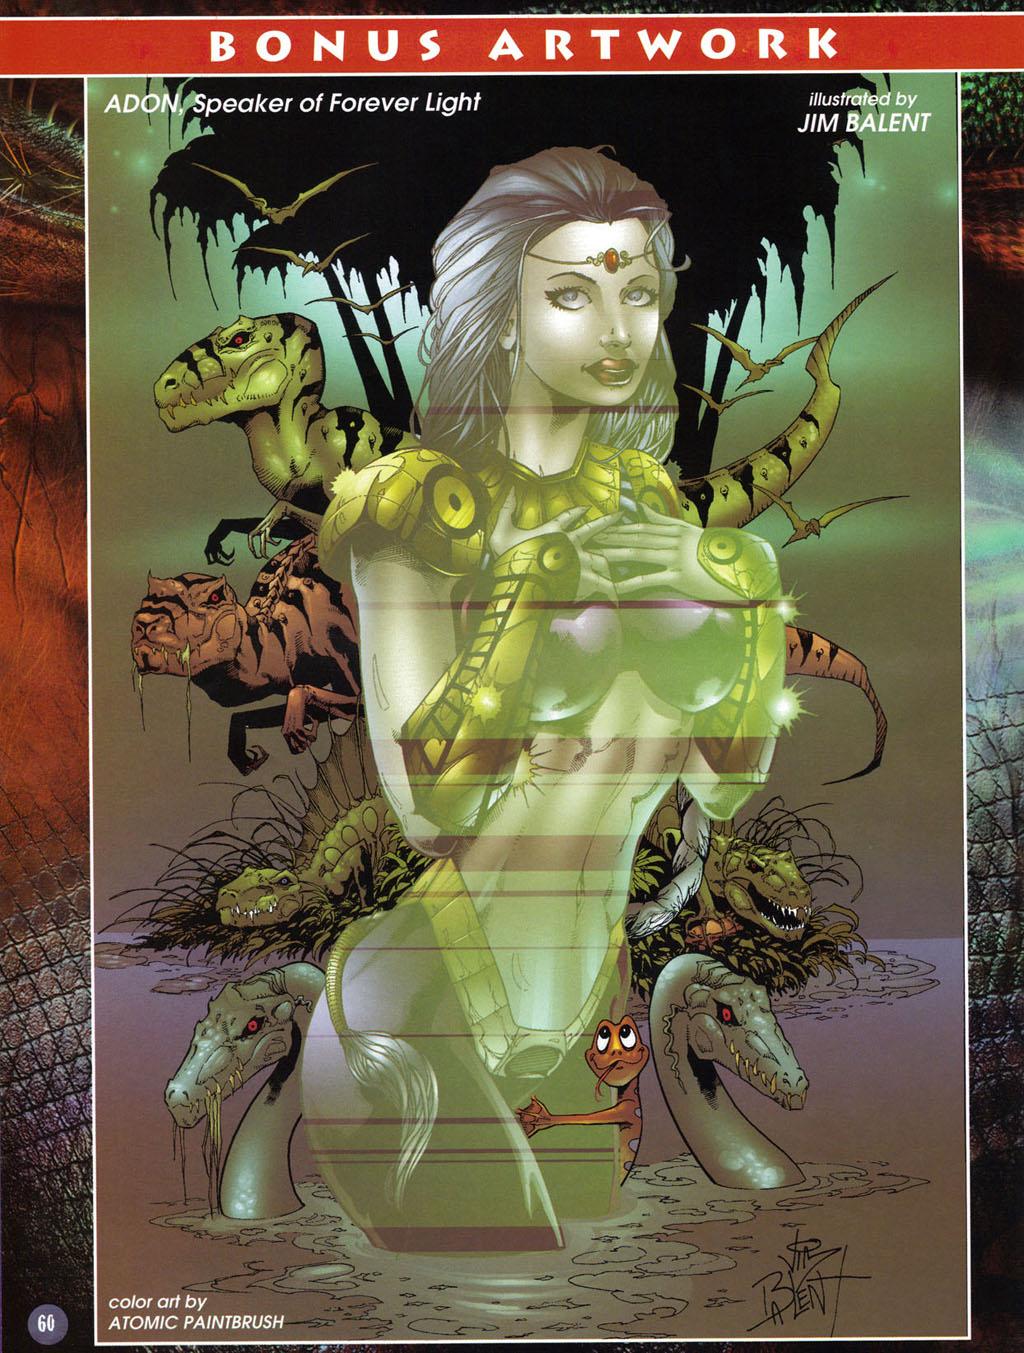 Read online Turok 2: Adon's Curse comic -  Issue # Full - 42